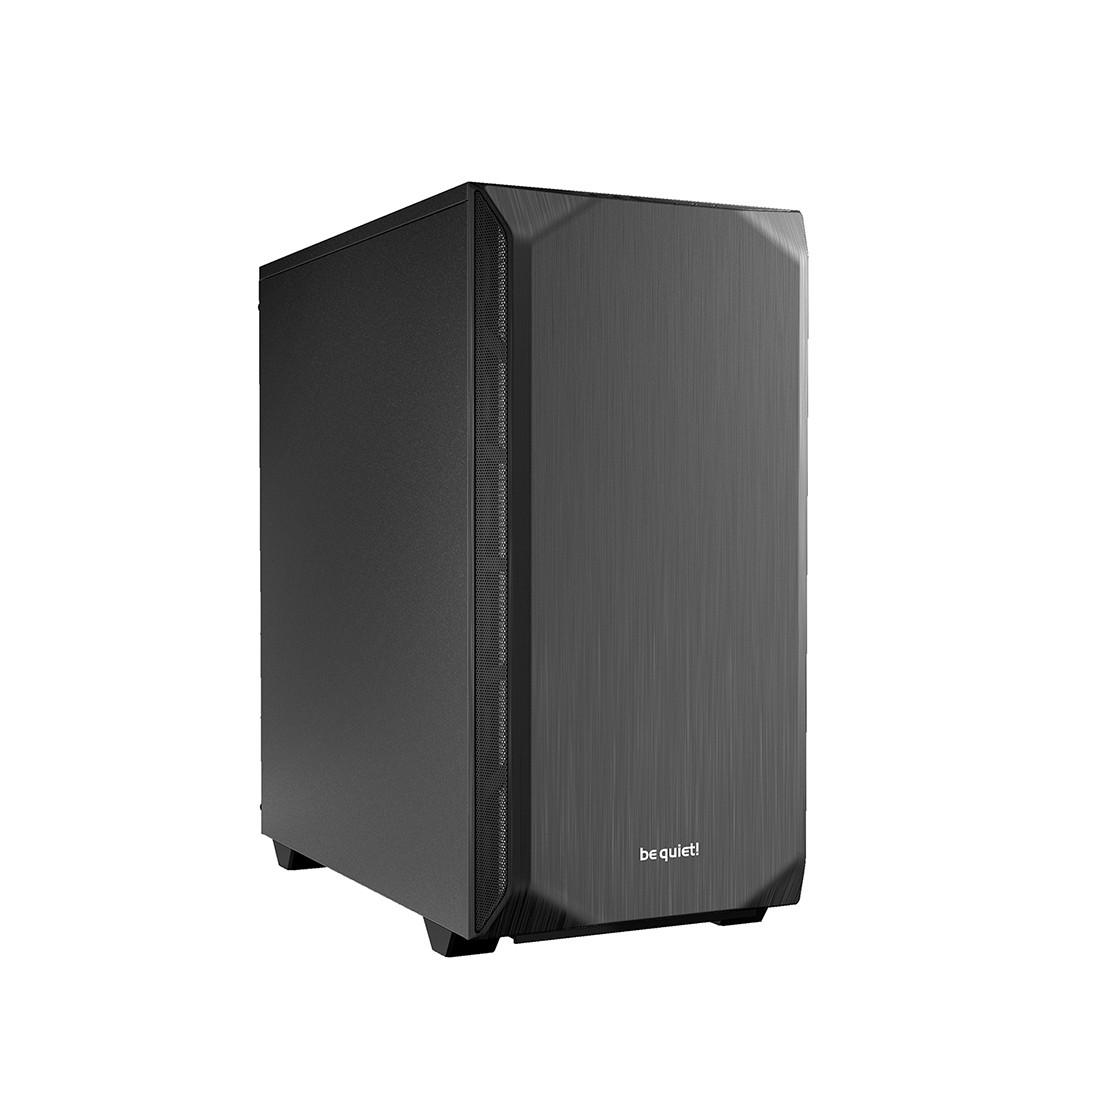 Компьютерный корпус  Bequiet!  Pure Base 500  BG034  Без Б/П